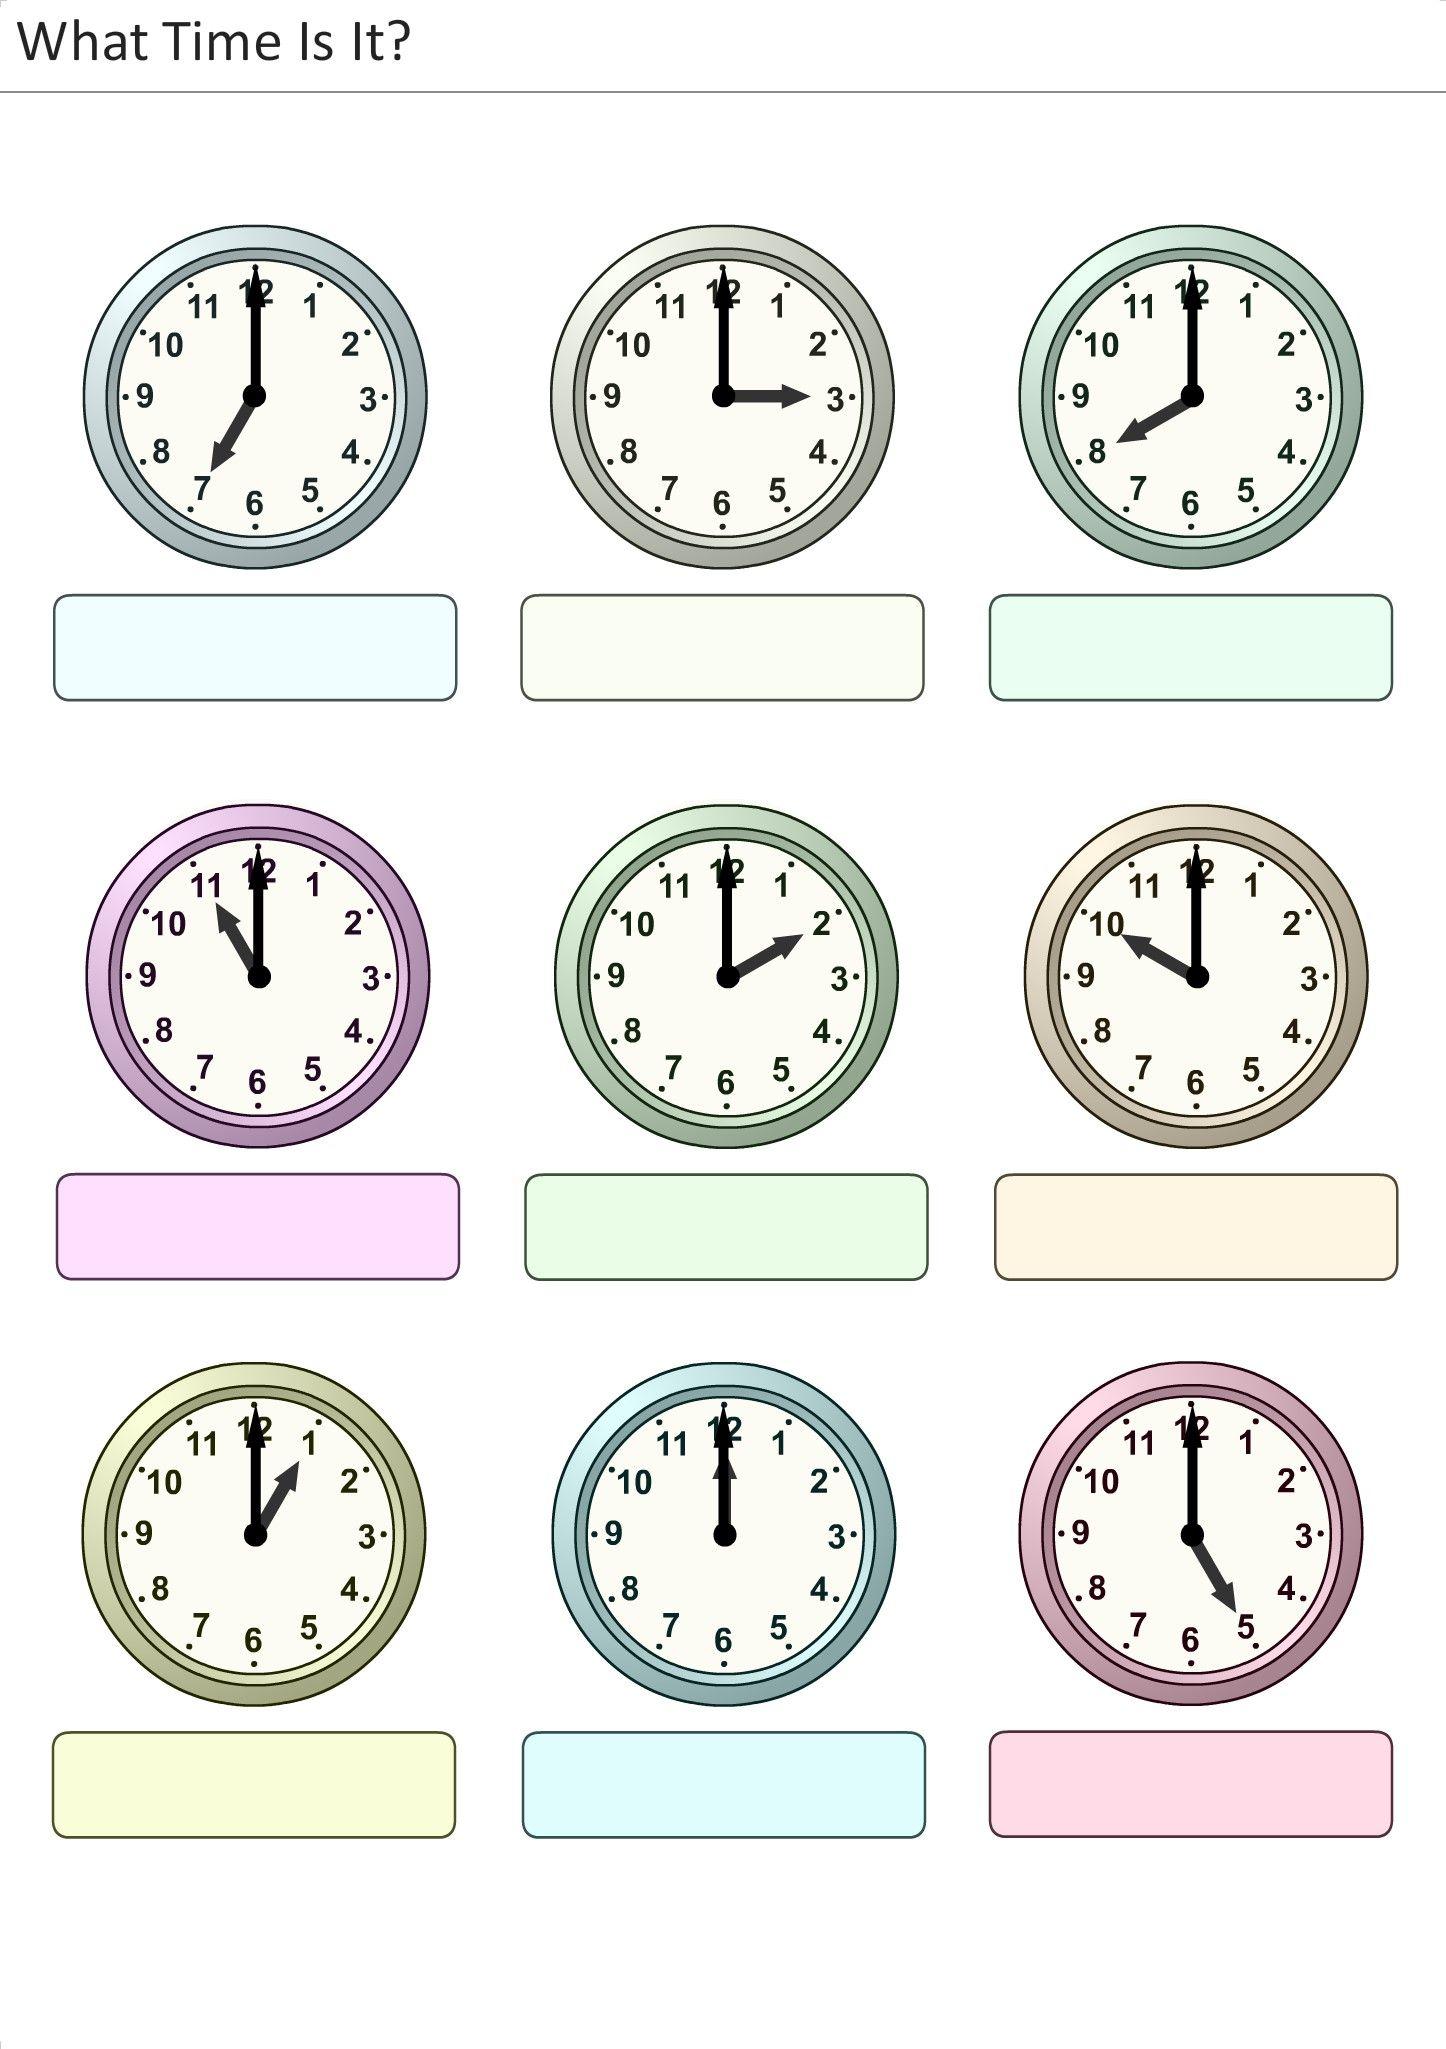 worksheet A Que Hora Worksheet actividades para preescolar primaria e inicial plantillas con relojes analogicos aprender la